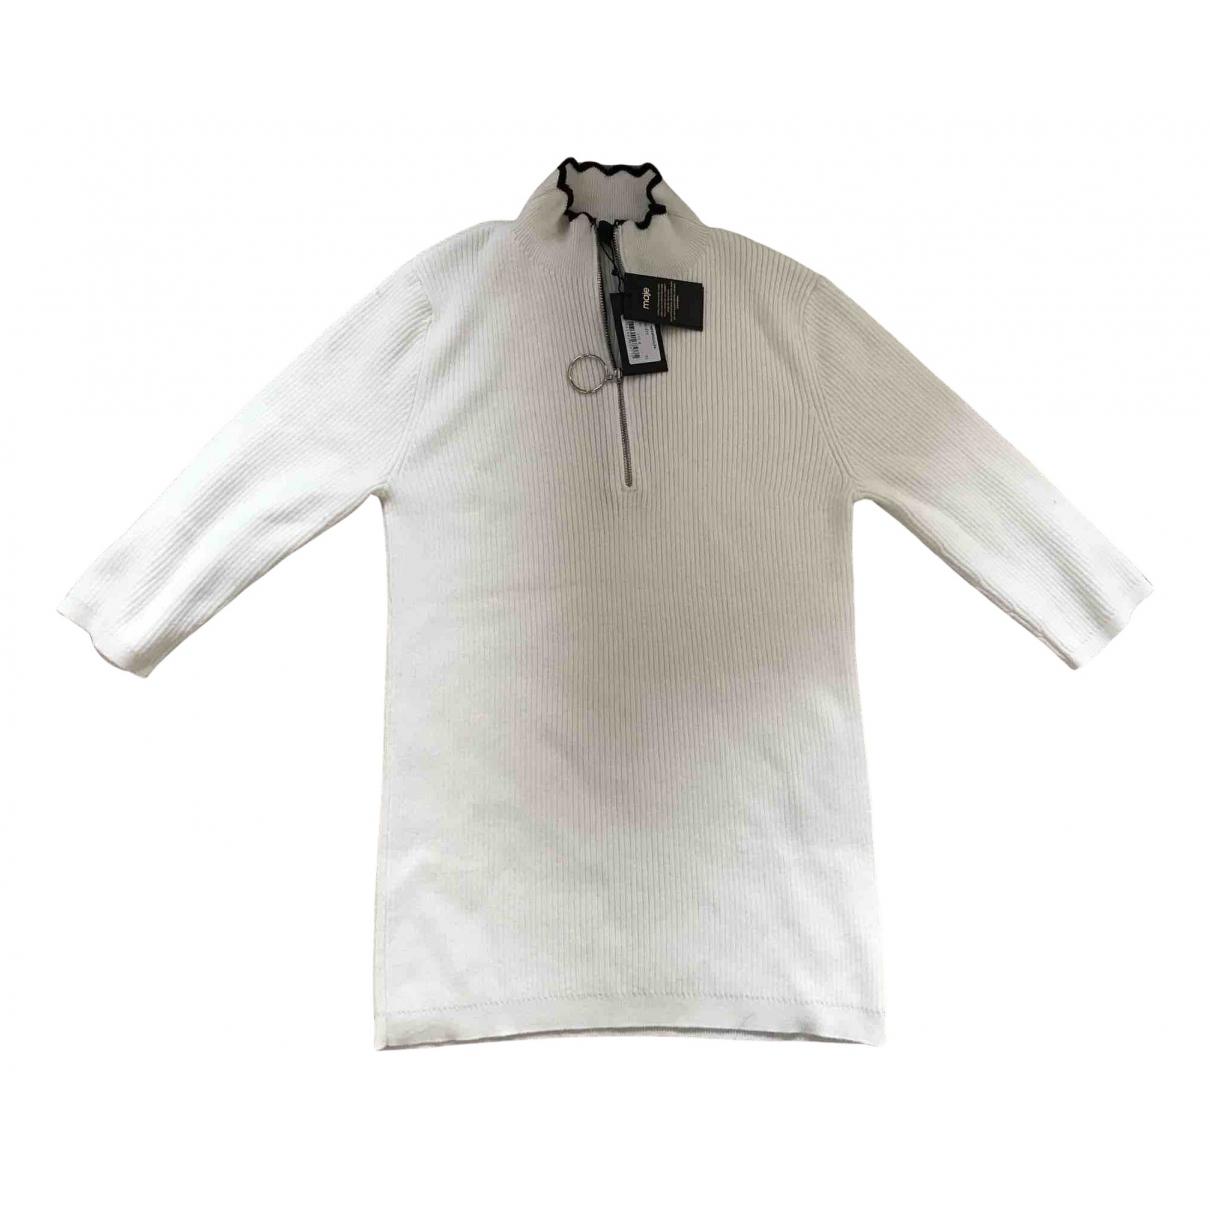 Maje Fall Winter 2019 White Cotton Knitwear for Women 34 FR